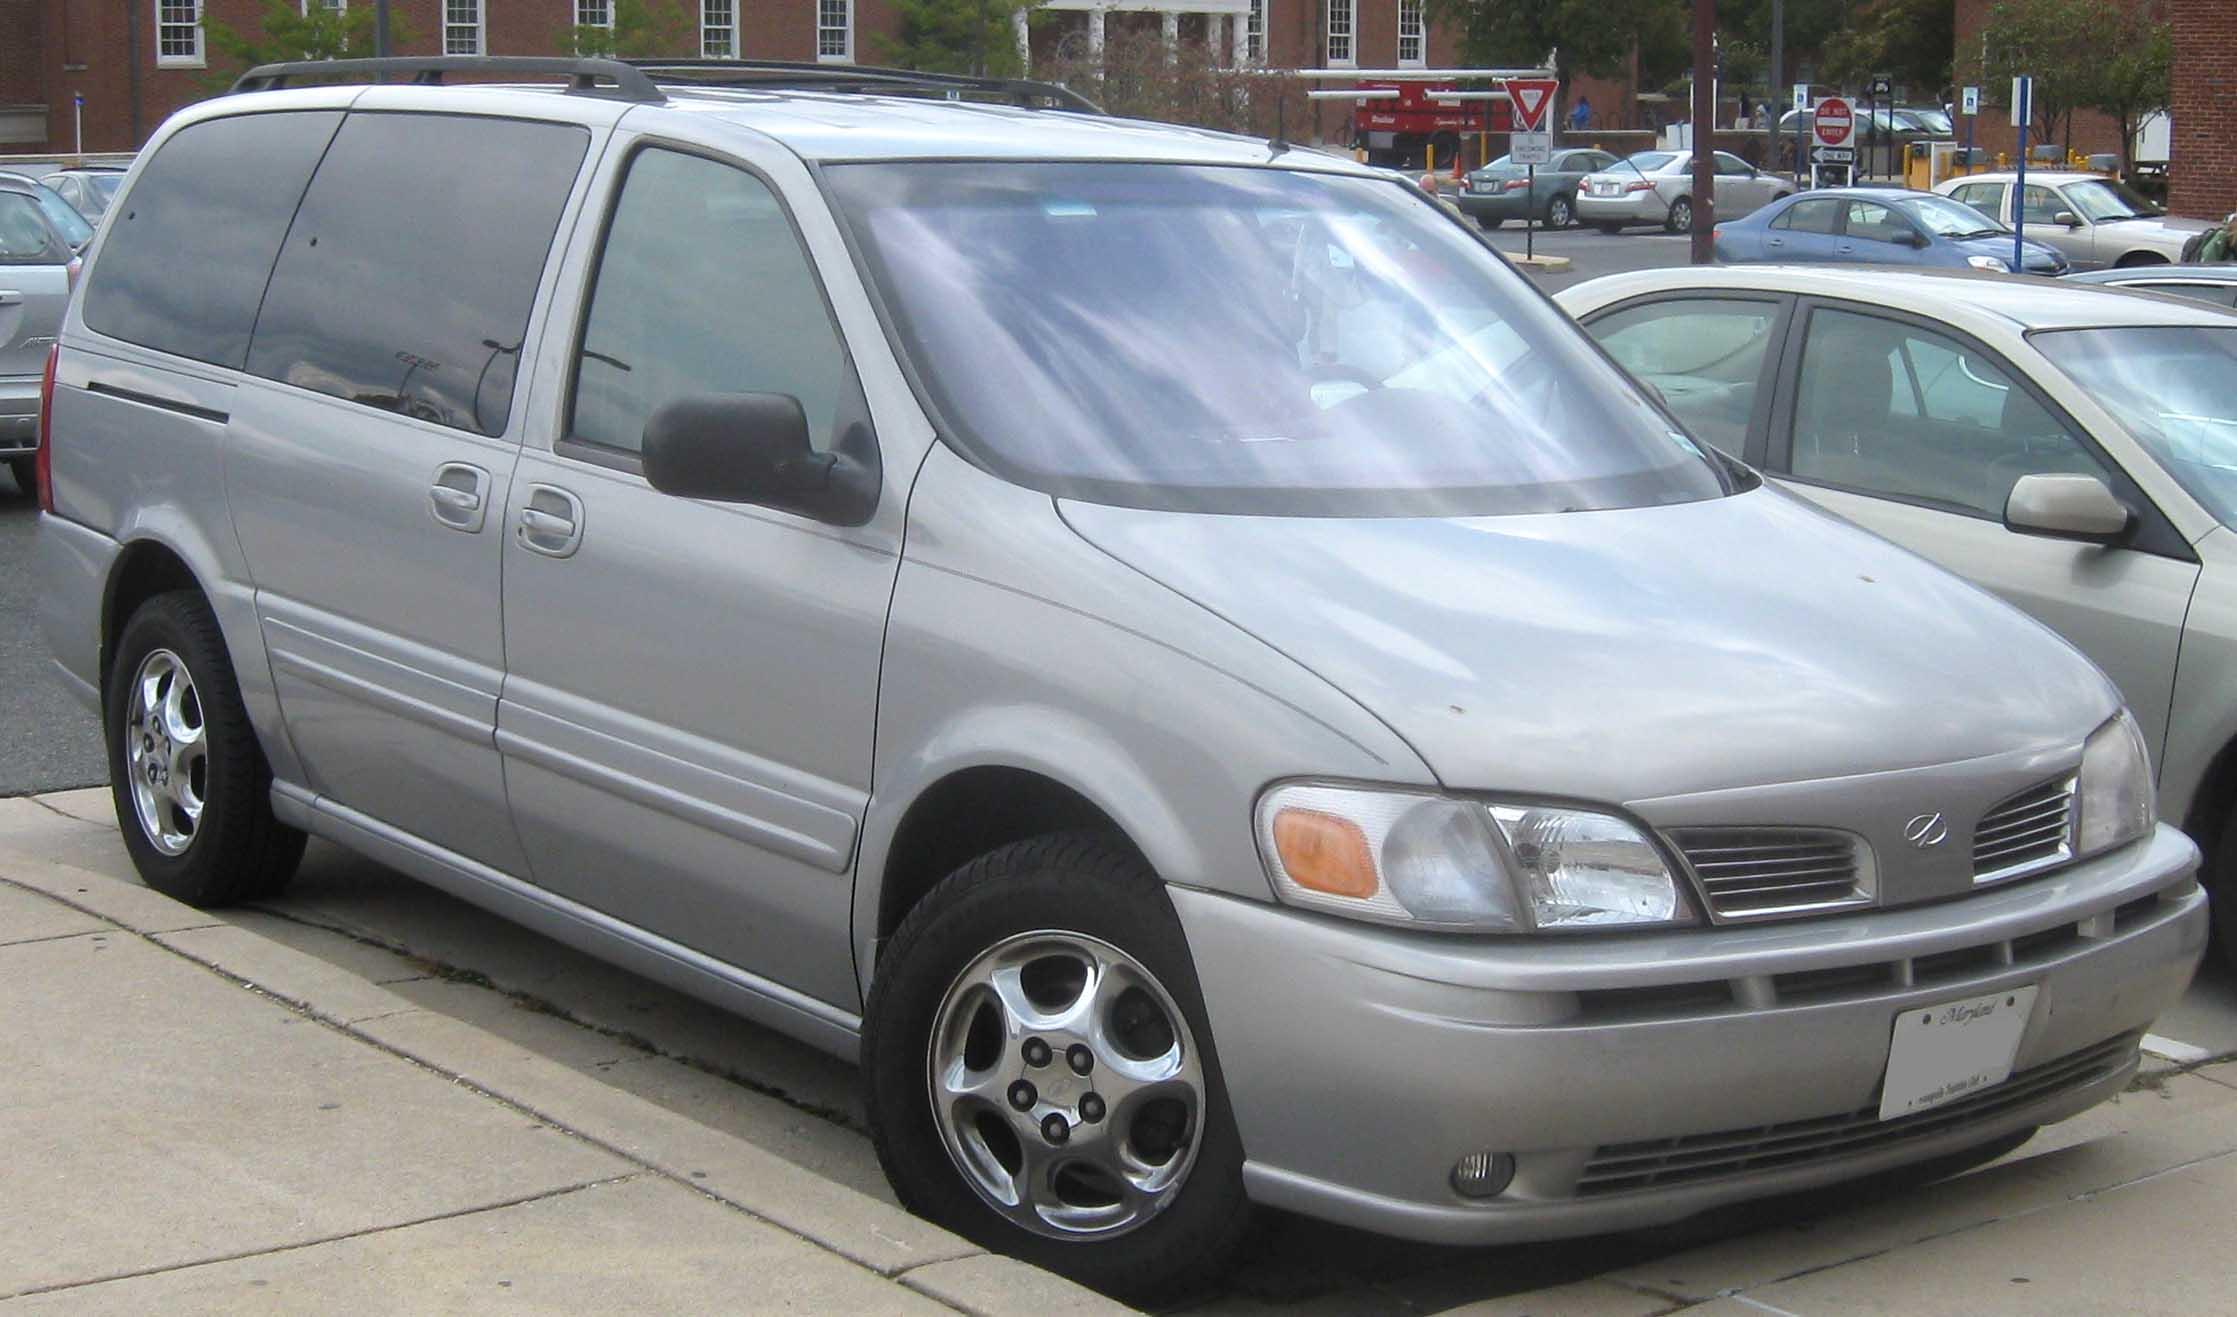 Oldsmobile Silhouette 2002 Photo - 1